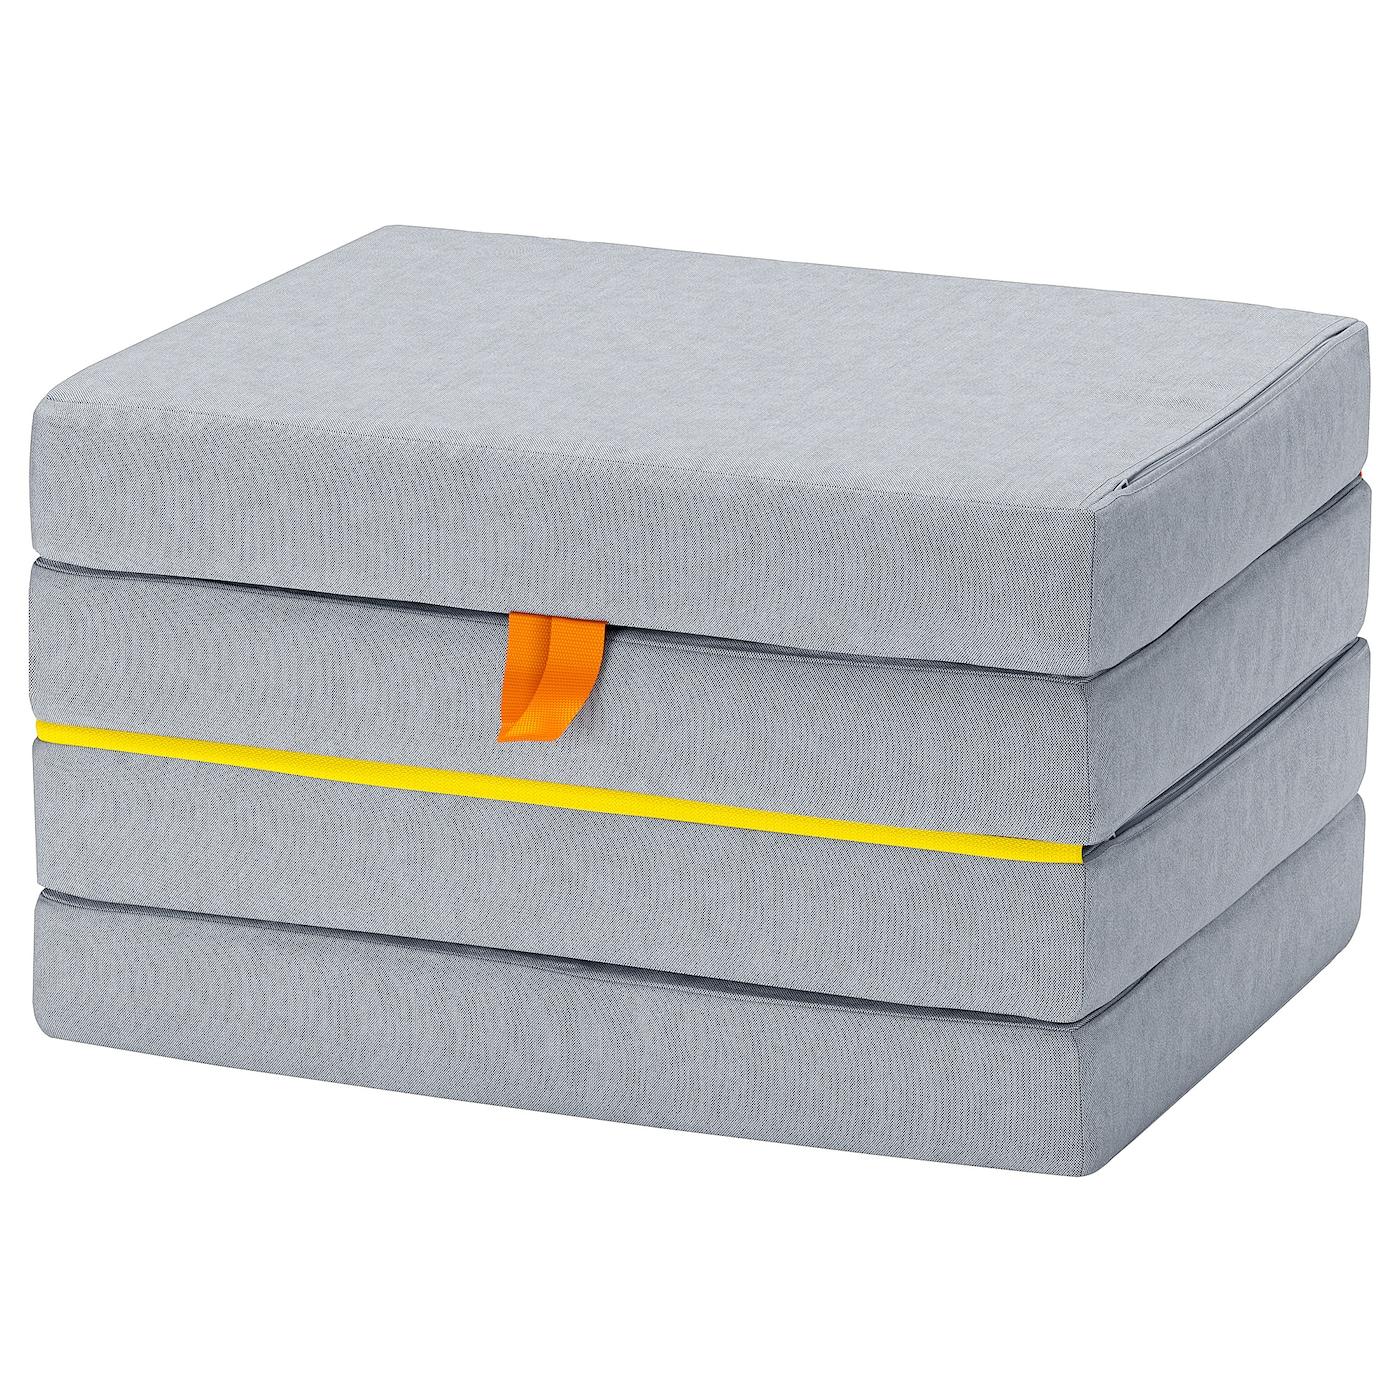 SLÄKT Puf/colchón plegable - IKEA